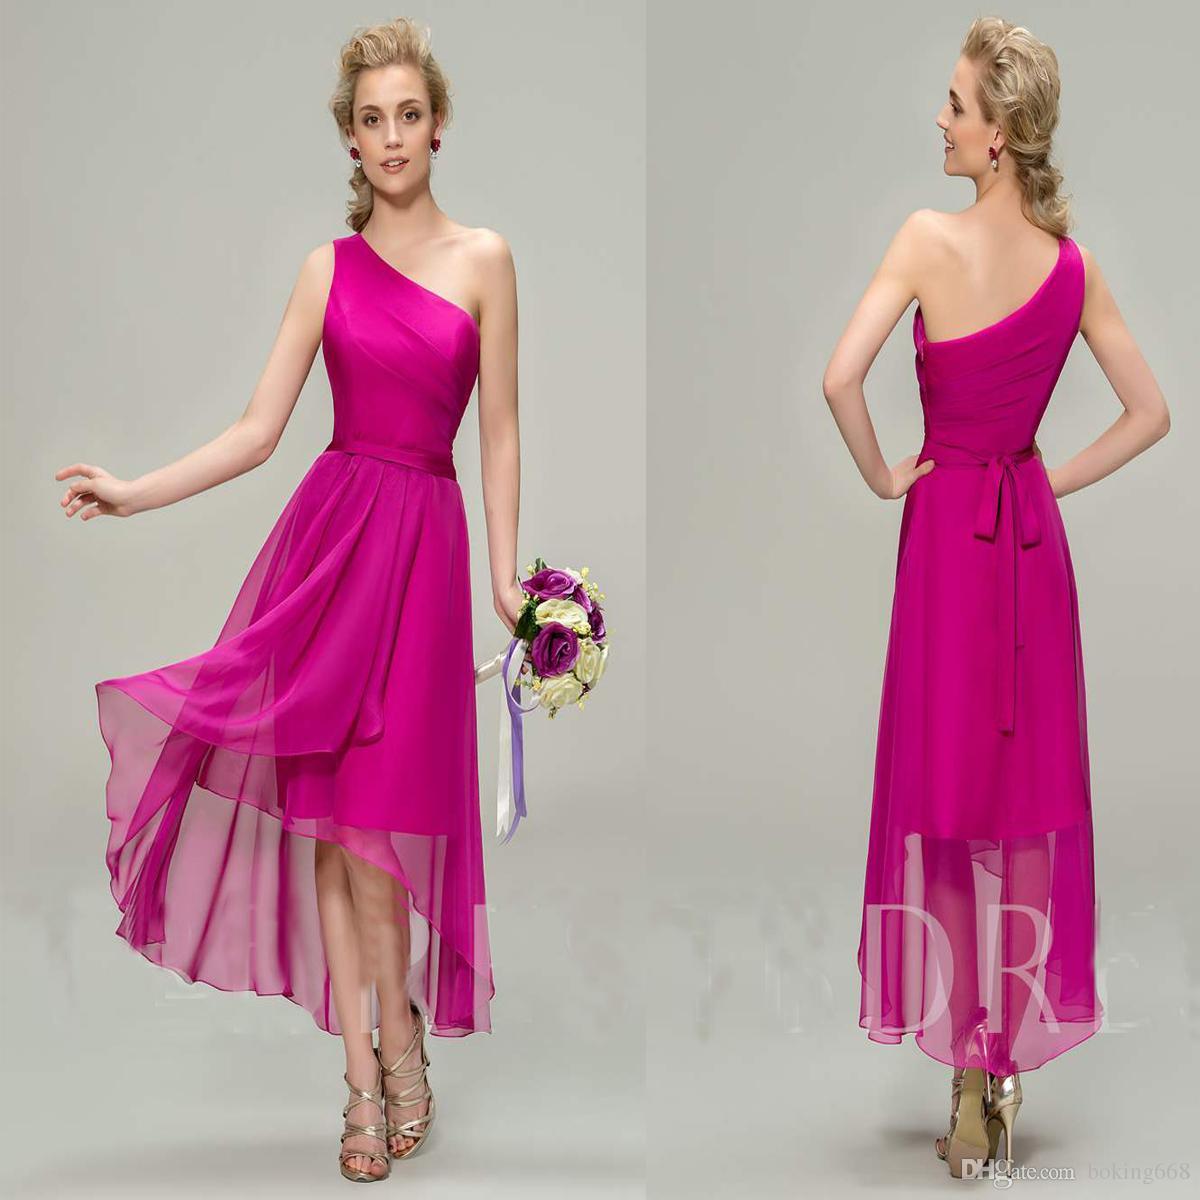 d4cc53108e2 2019 Cheap Asymmetry Sashes Bridesmaid Dresses Chiffon Summer Sleeveless One  Shoulder Bridesmaid Formal Prom Party Dresses Robe De Soiree Beach  Bridesmaid ...